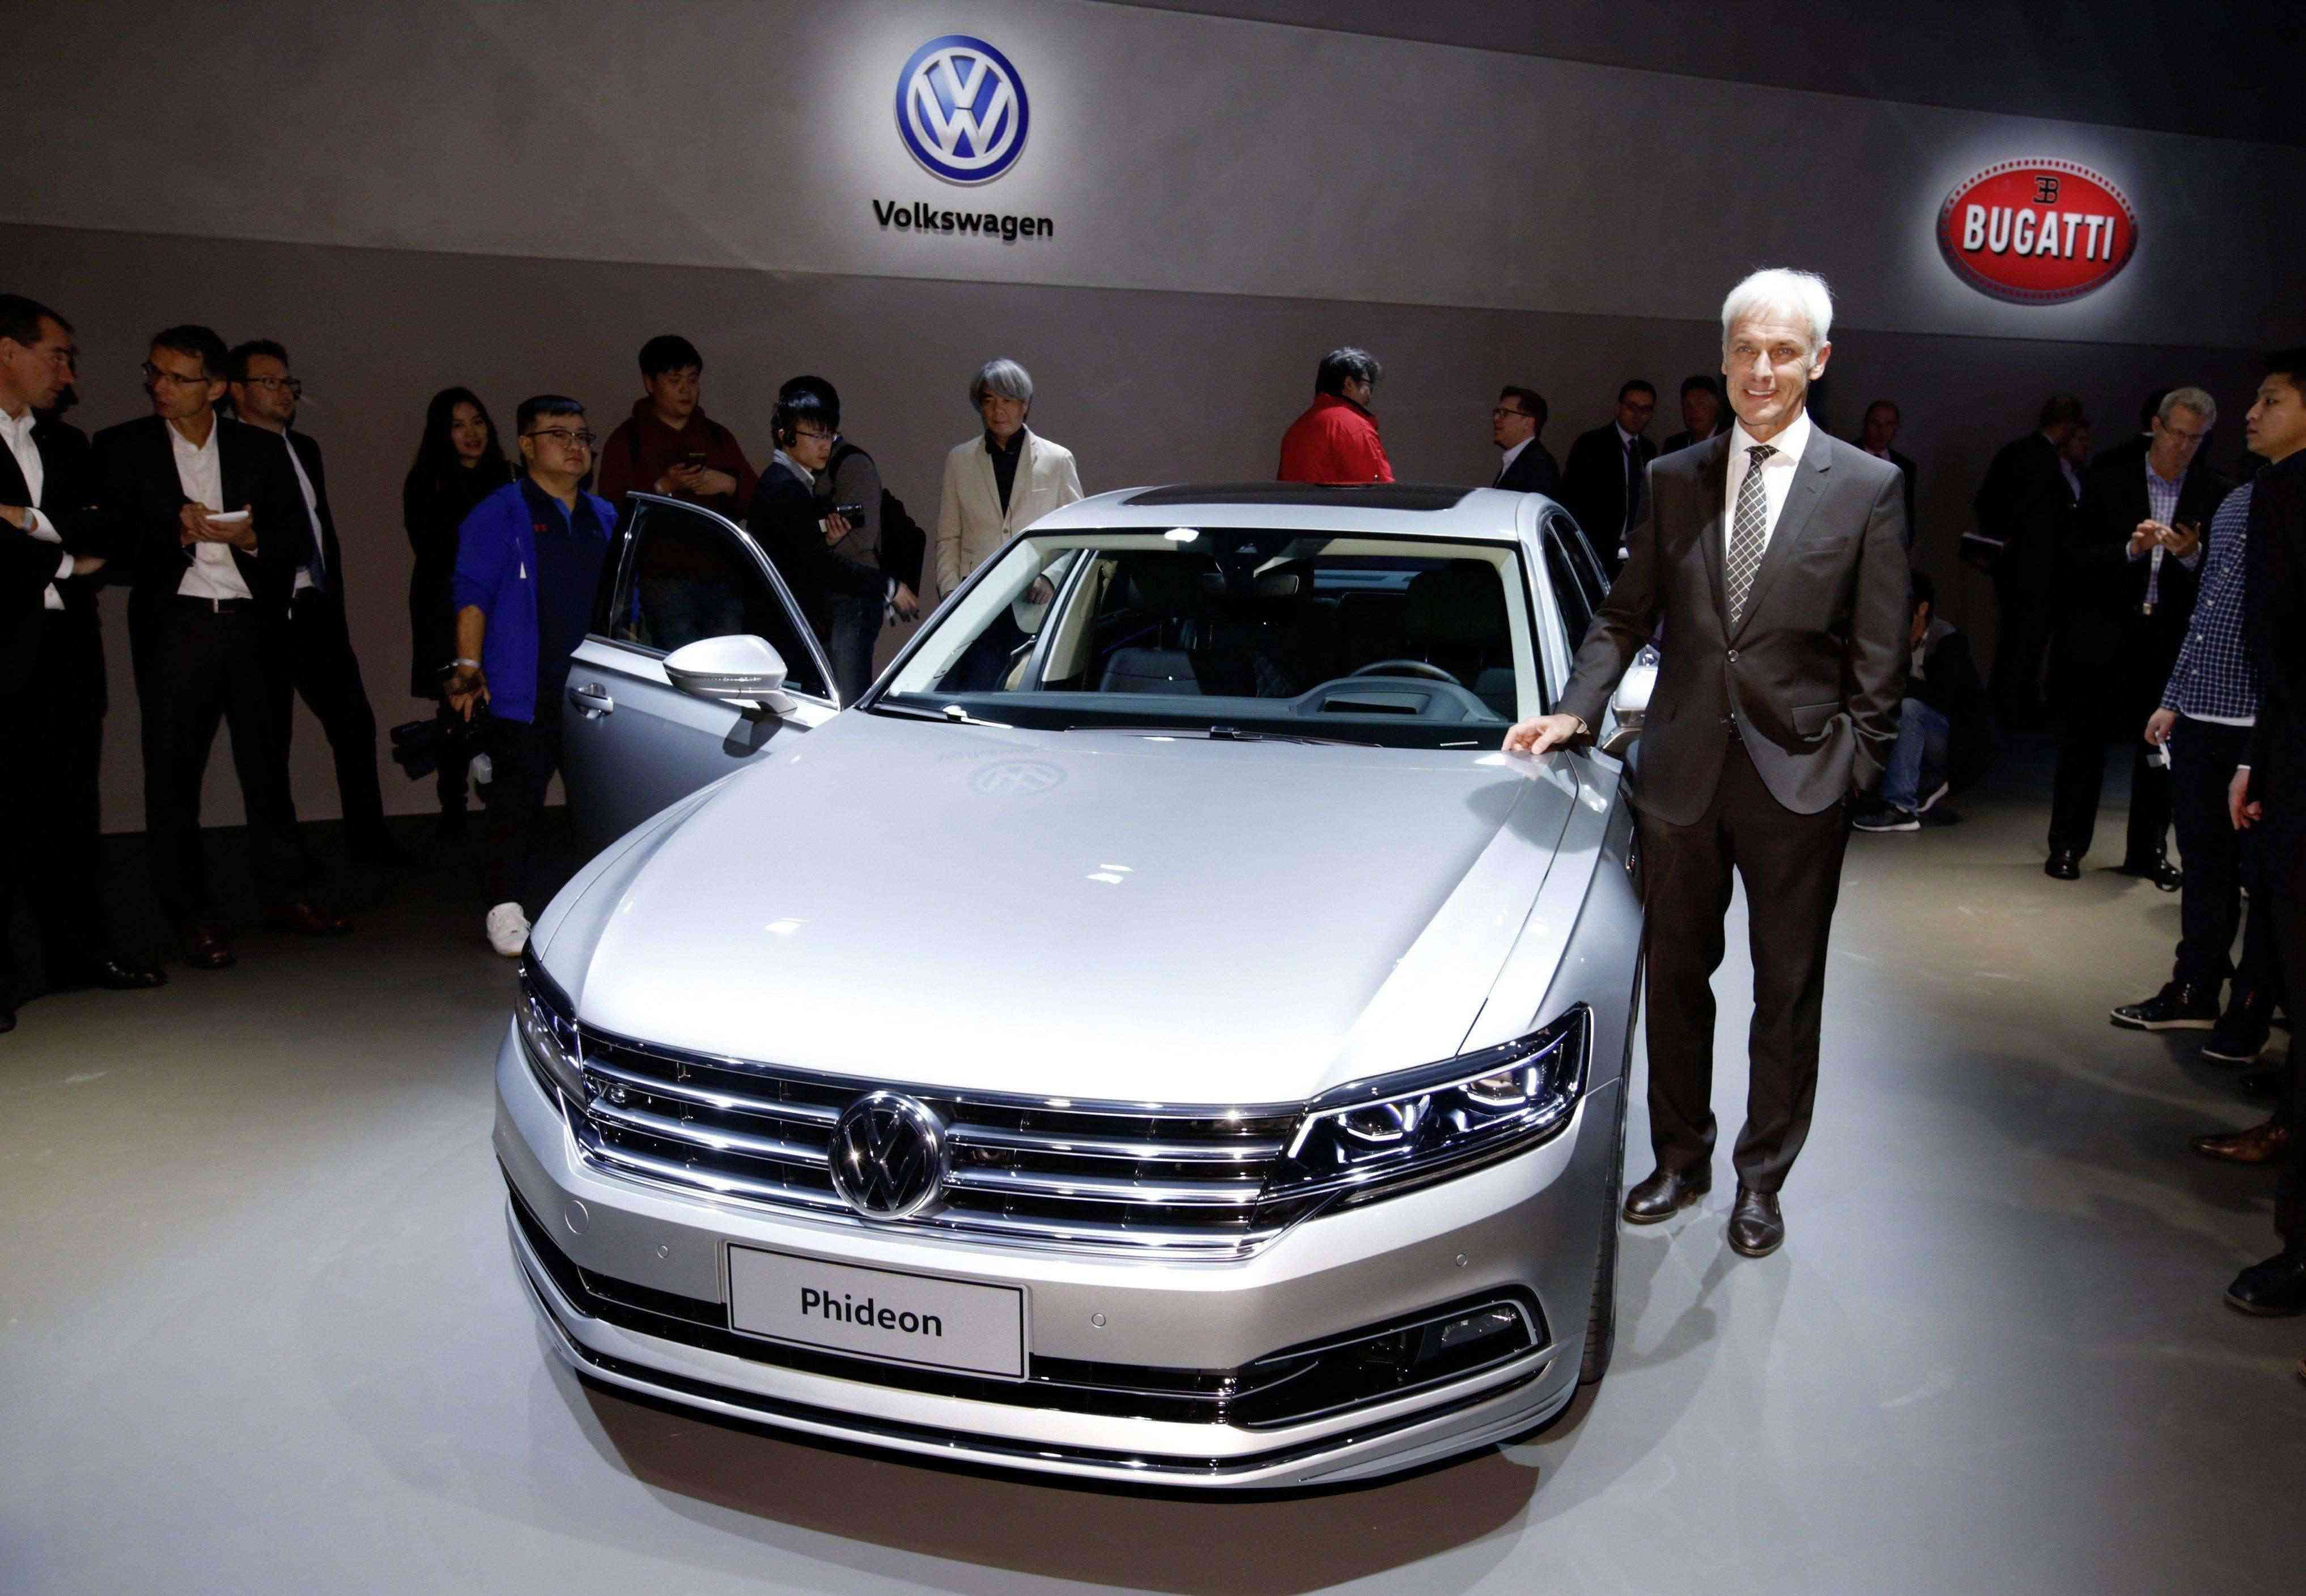 Volkswagen Phideon: sedã de alto luxo é apresentado em Genebra